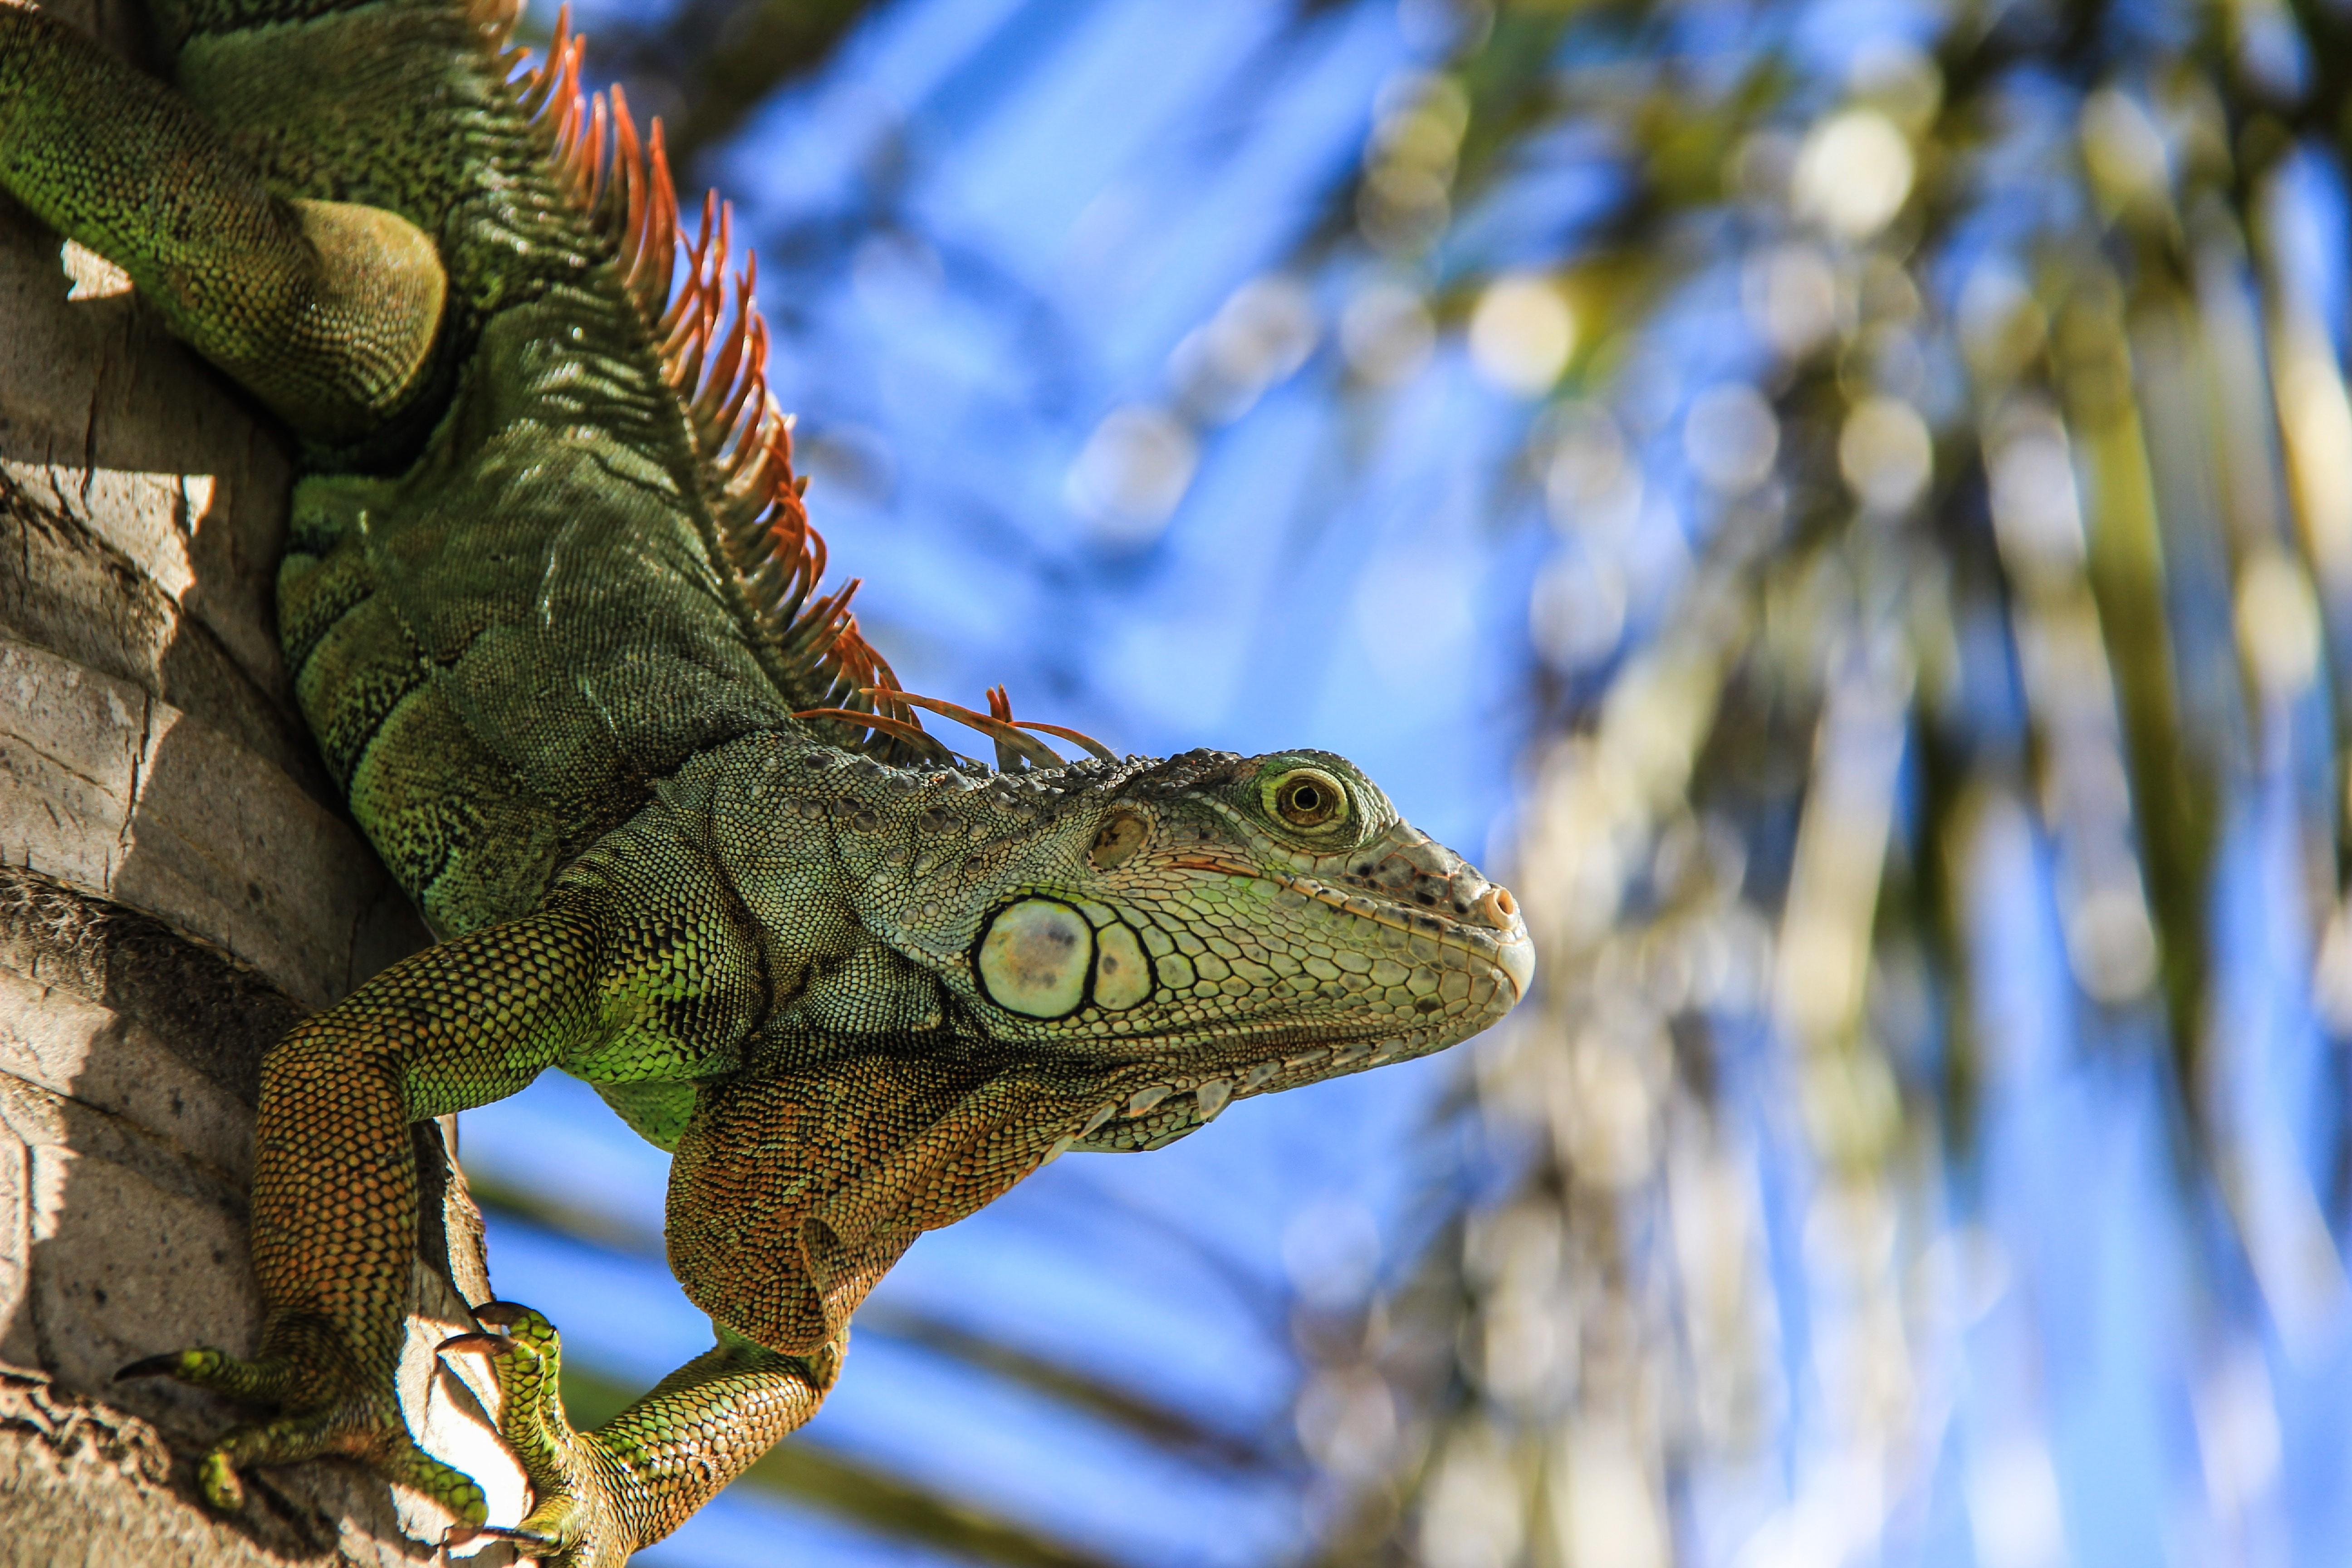 Iguana Wallpaper 21   5184 X 3456 stmednet 5184x3456